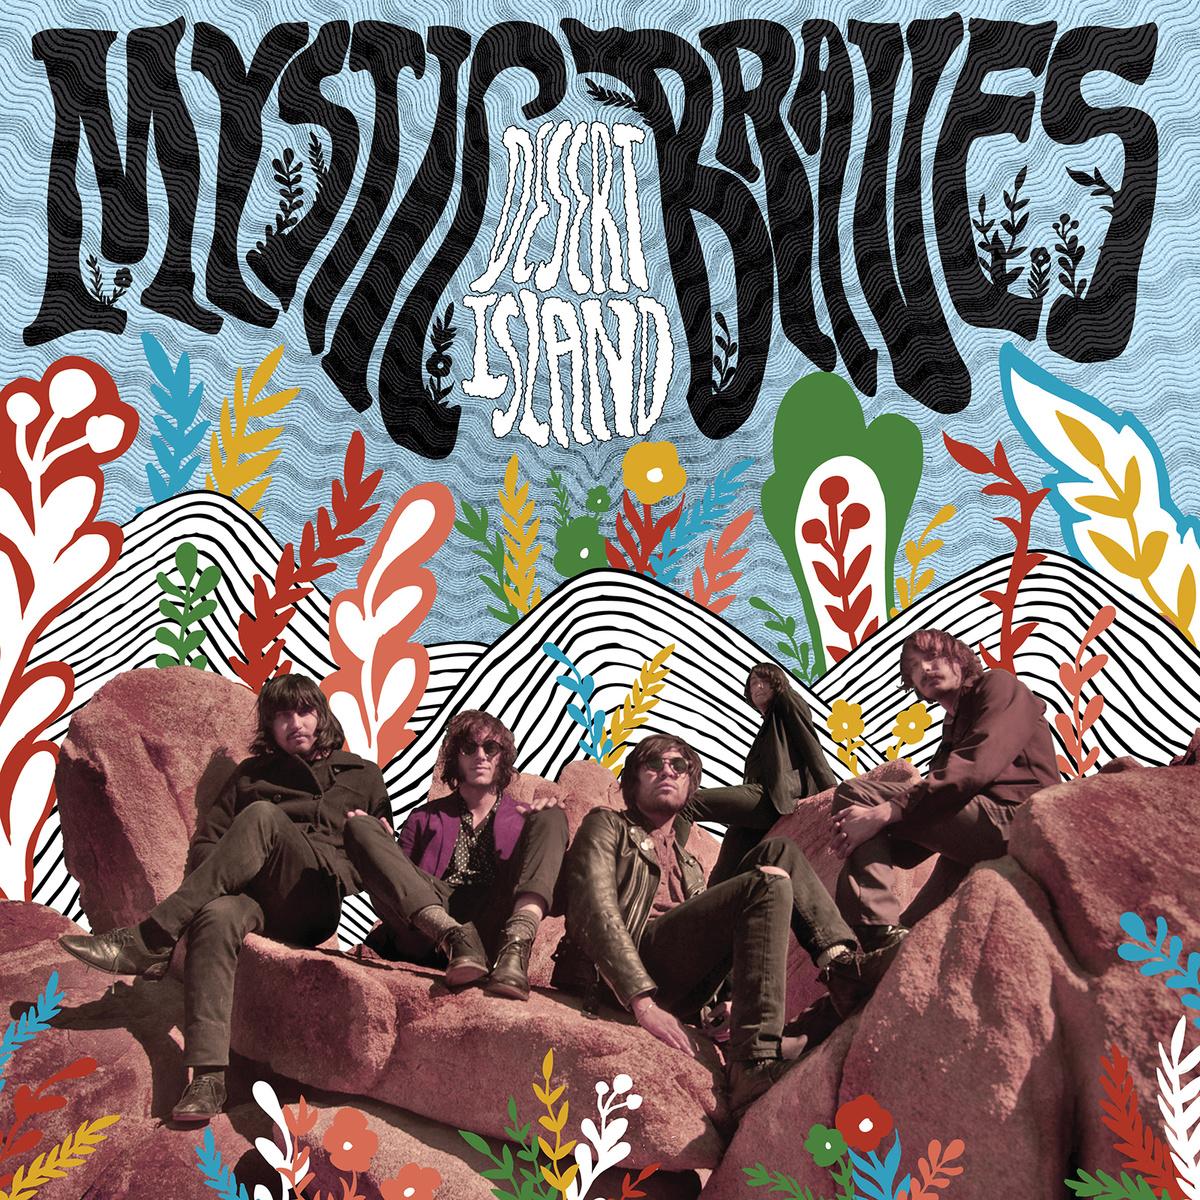 MYSTIC BRAVES – Desert Island